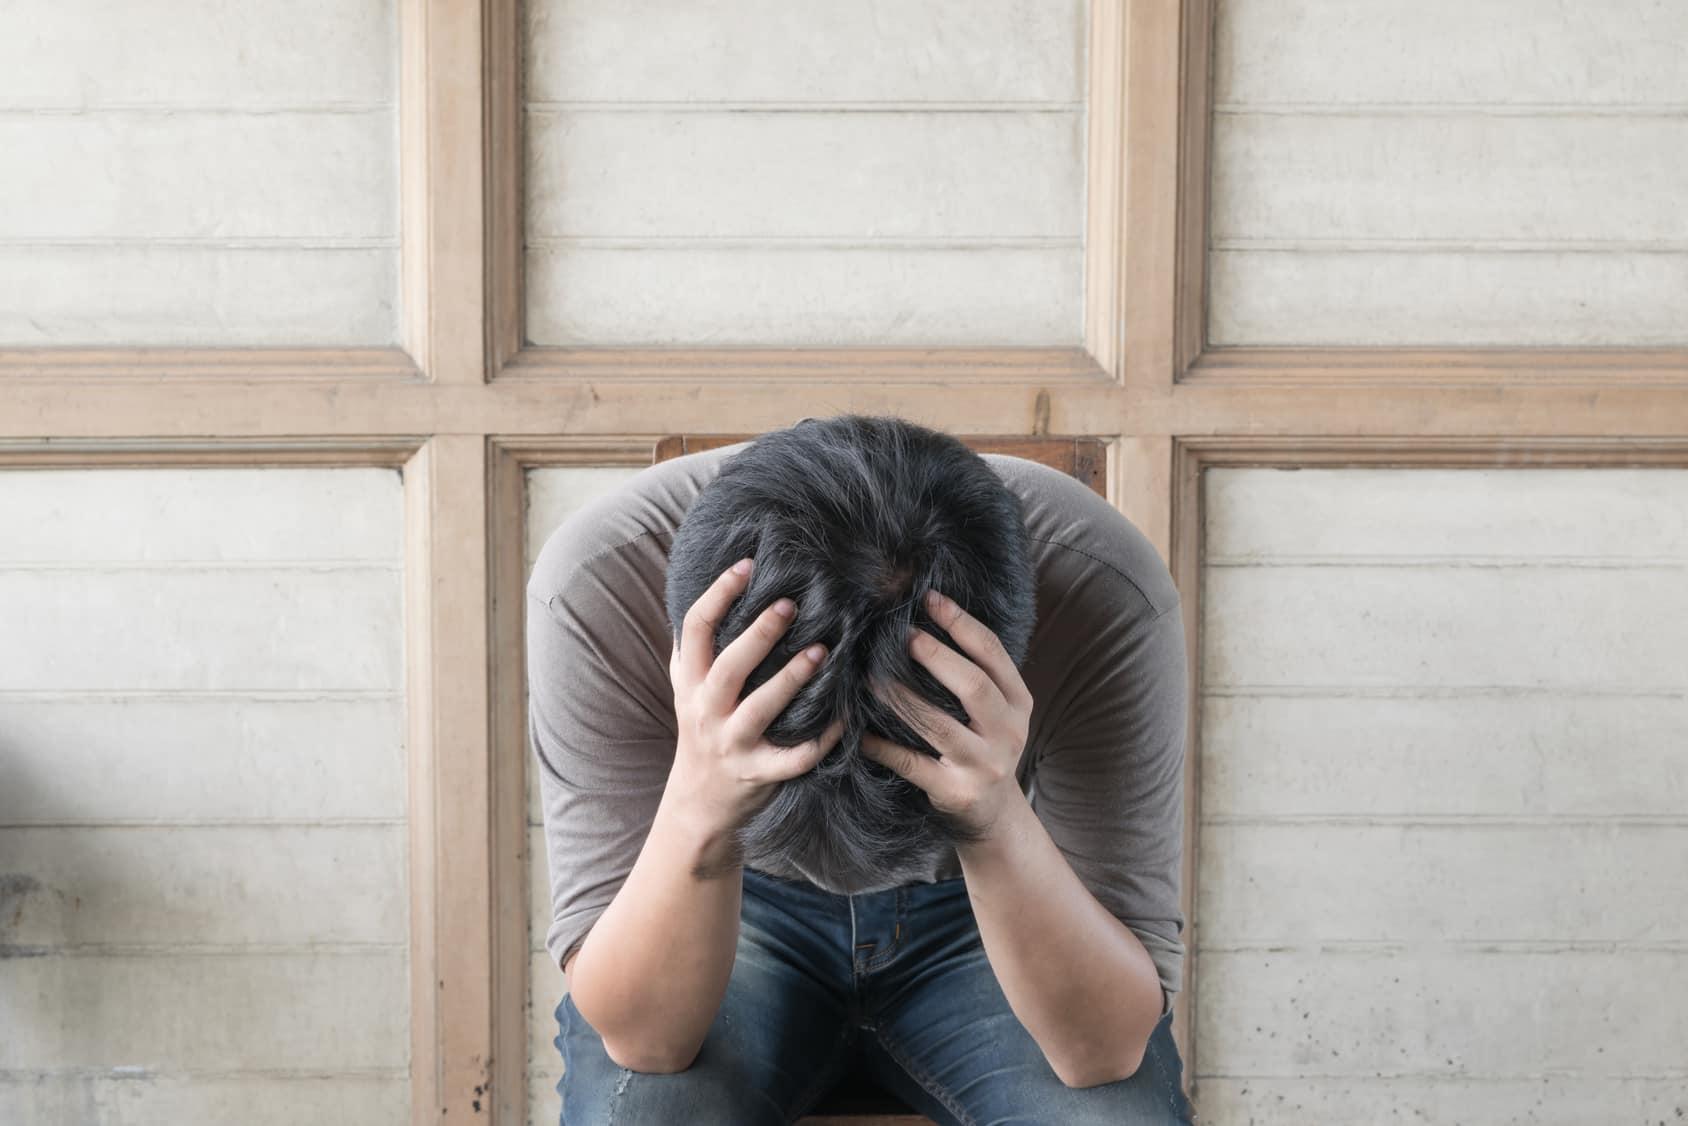 consolation-tristesse-peine-bible-evangile-jesus-christ